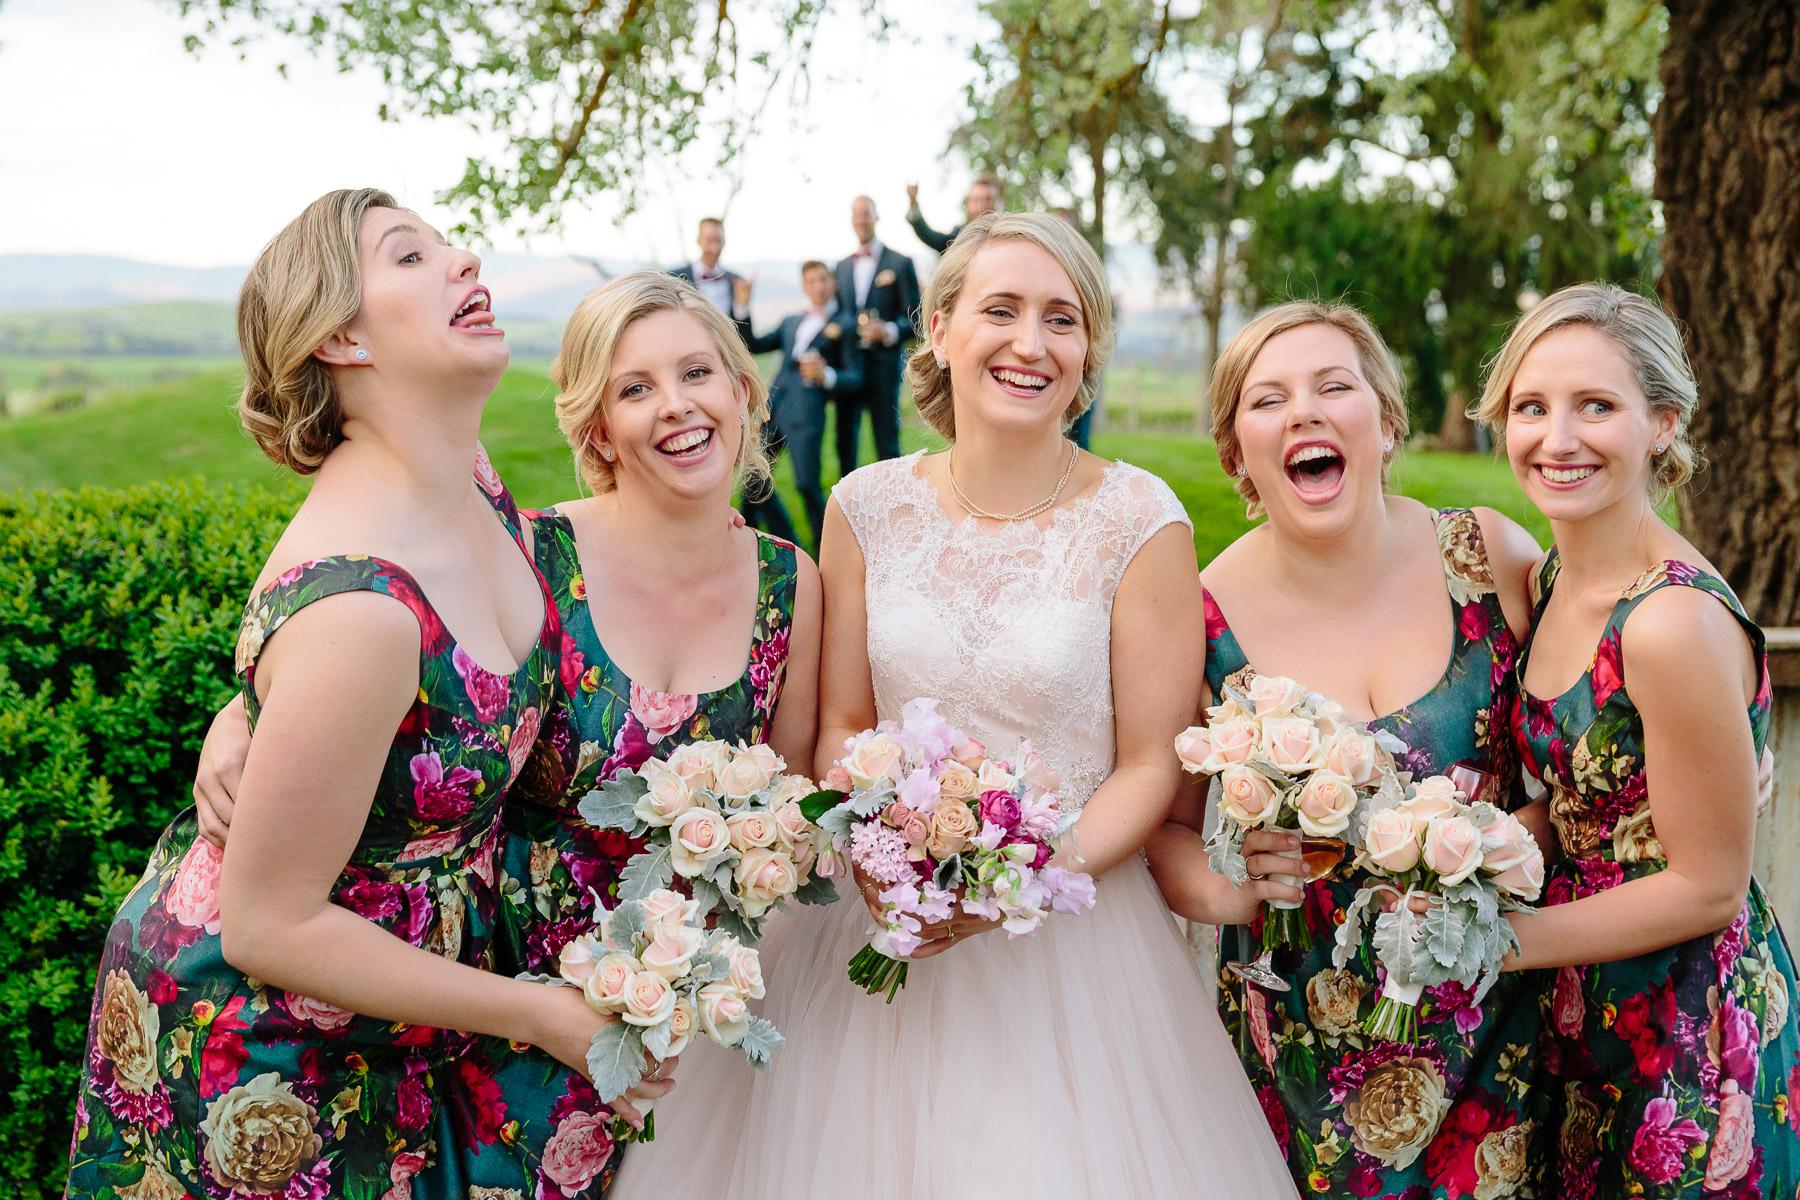 Marnie_and_Charlie_Yarra_Valley_Wedding_Blog-64.jpg